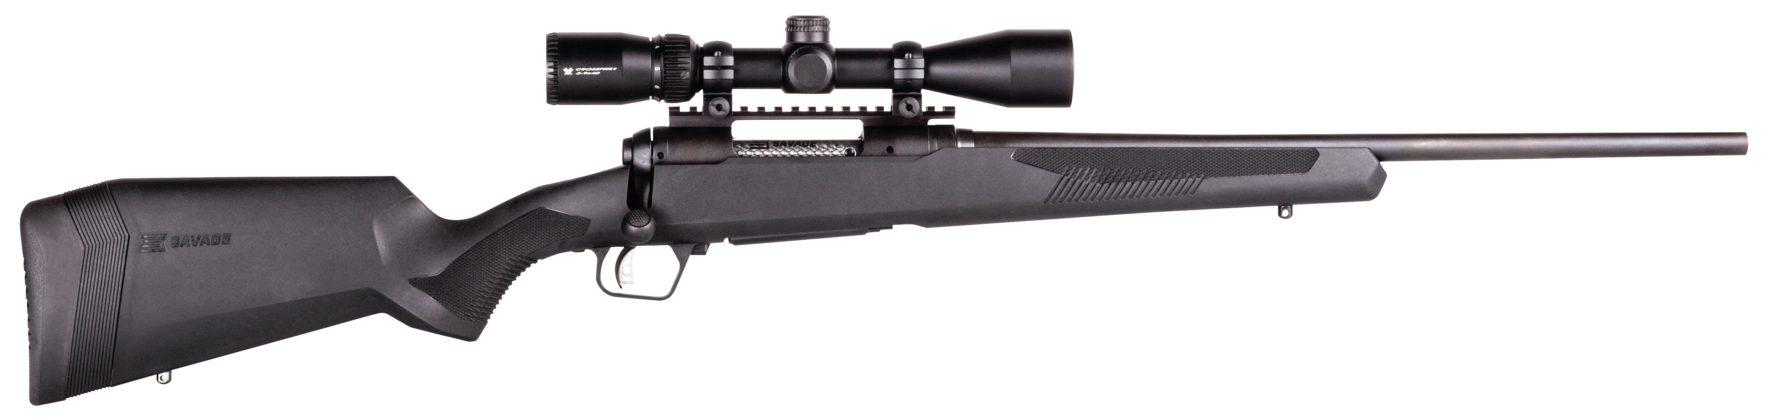 110 Apex Hunter XP Savage